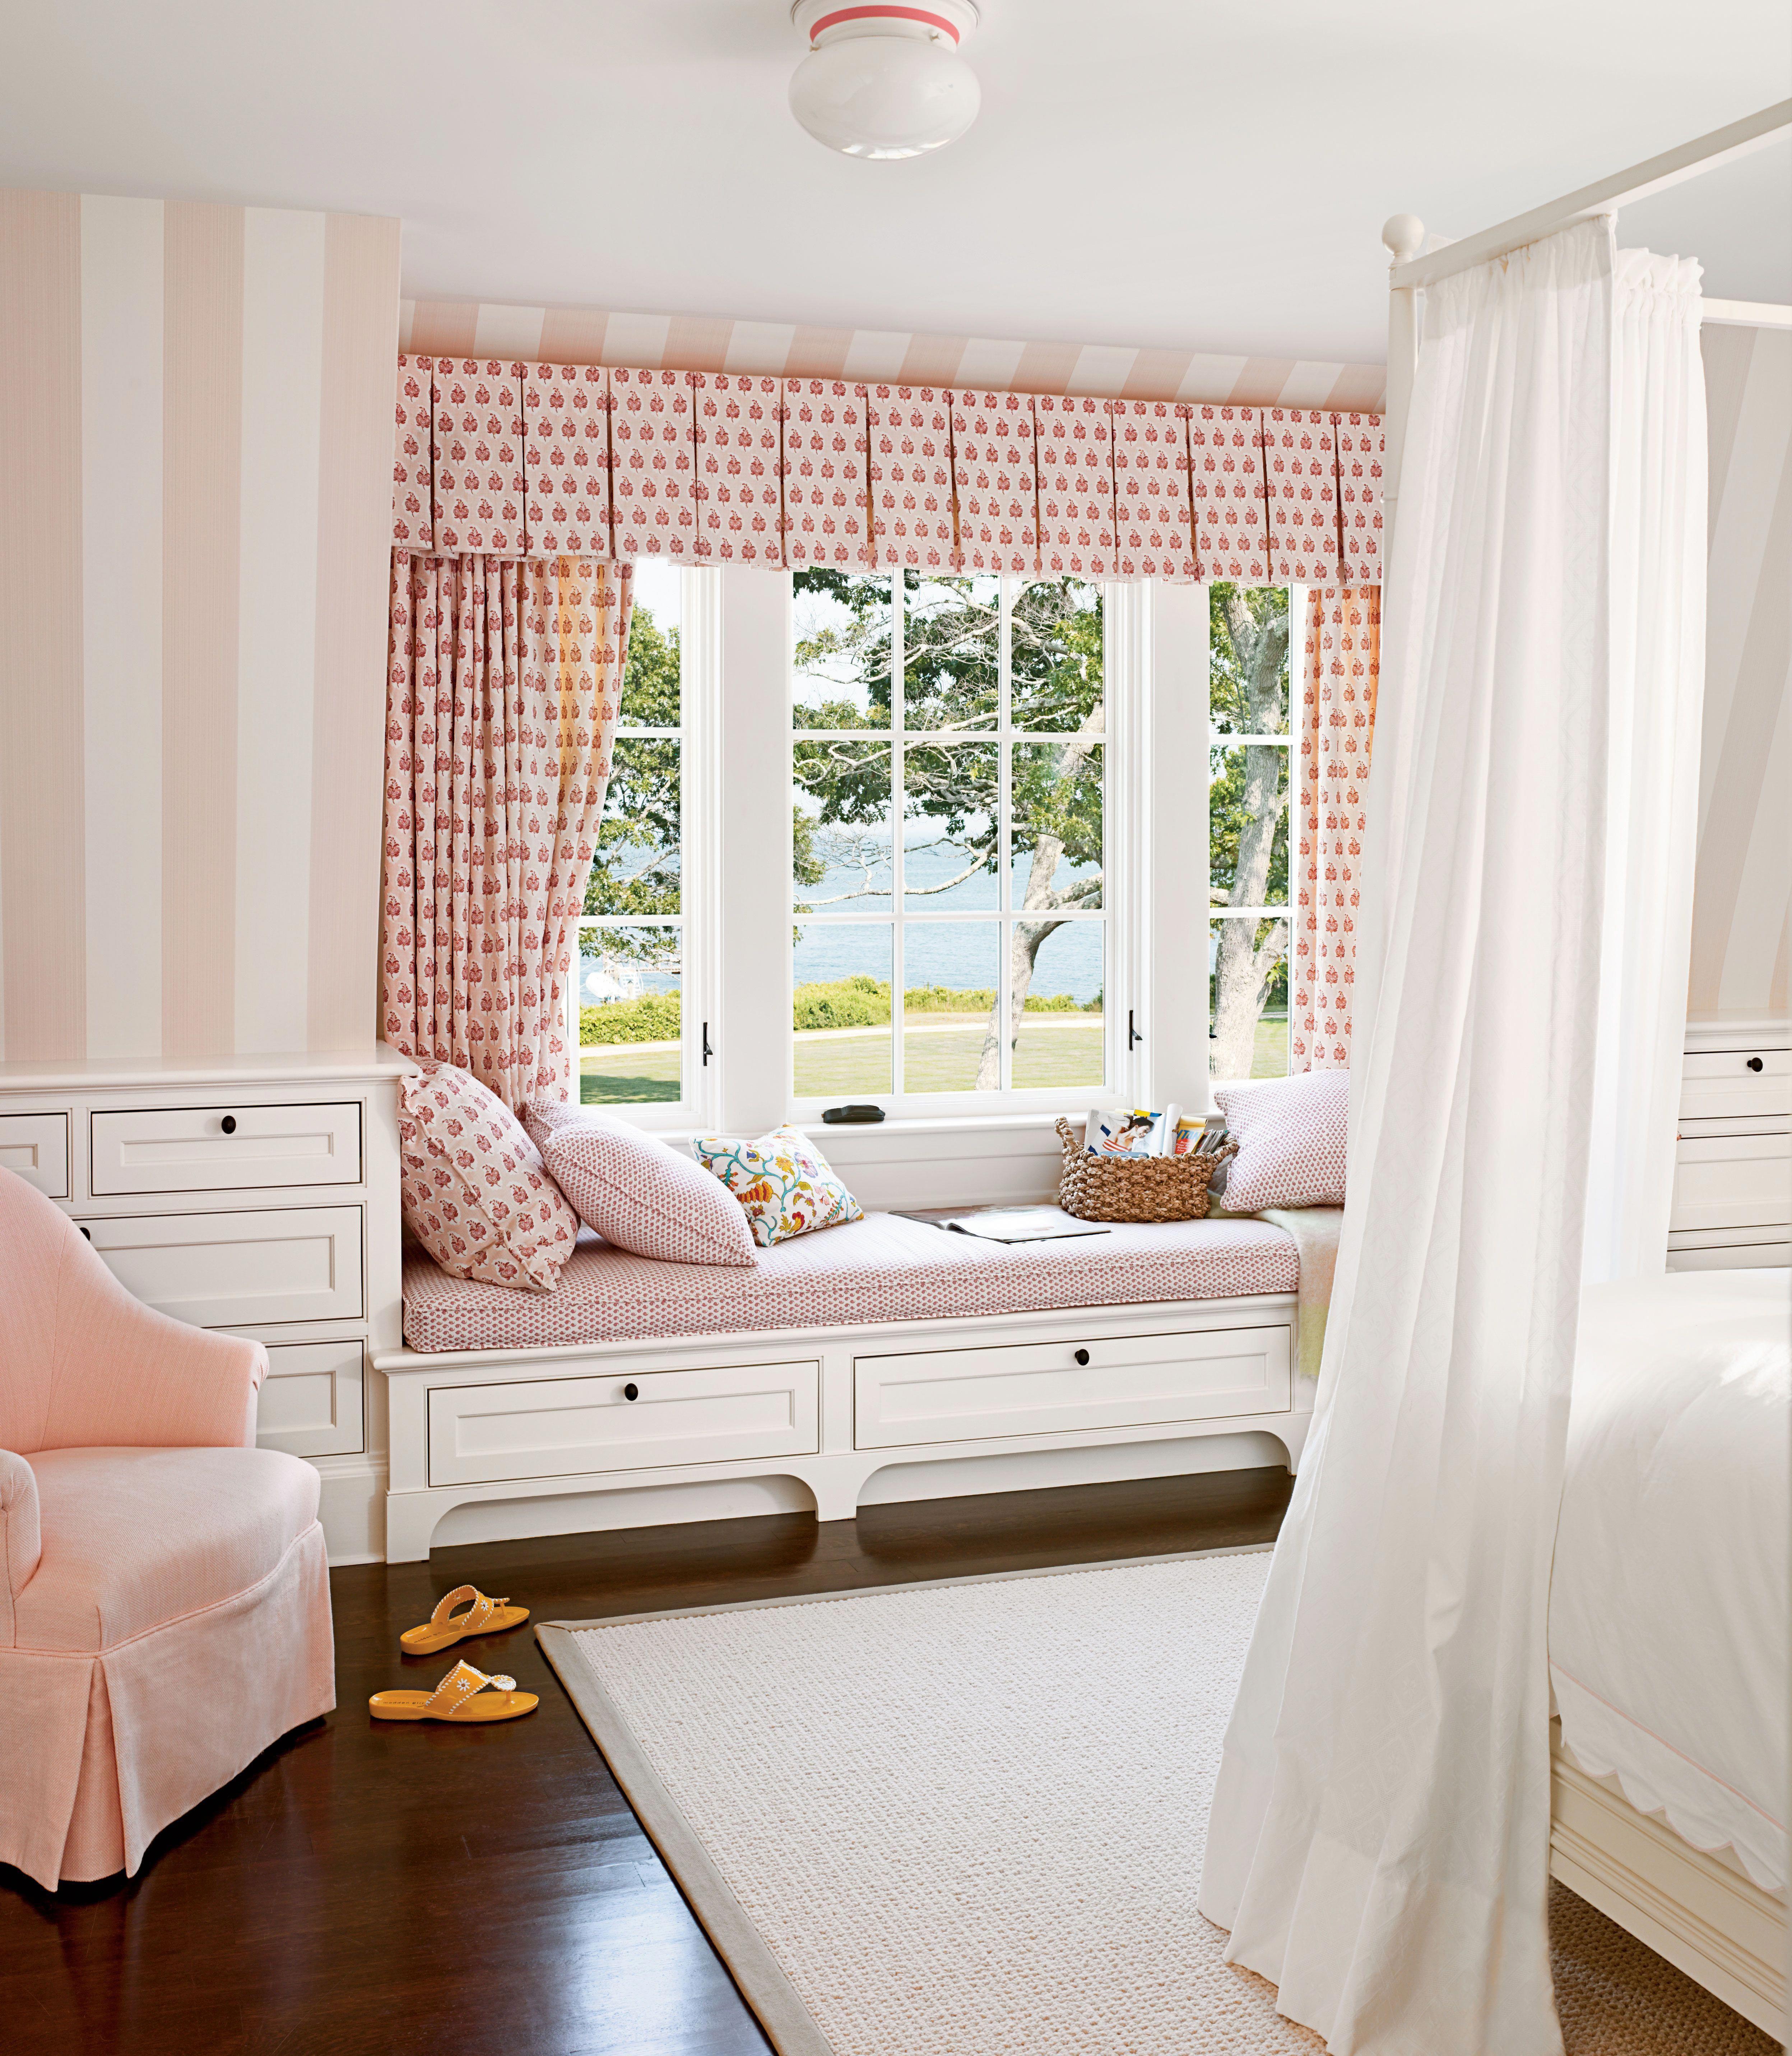 Bed under window  window seat coastallivingrooms  coastal living rooms in